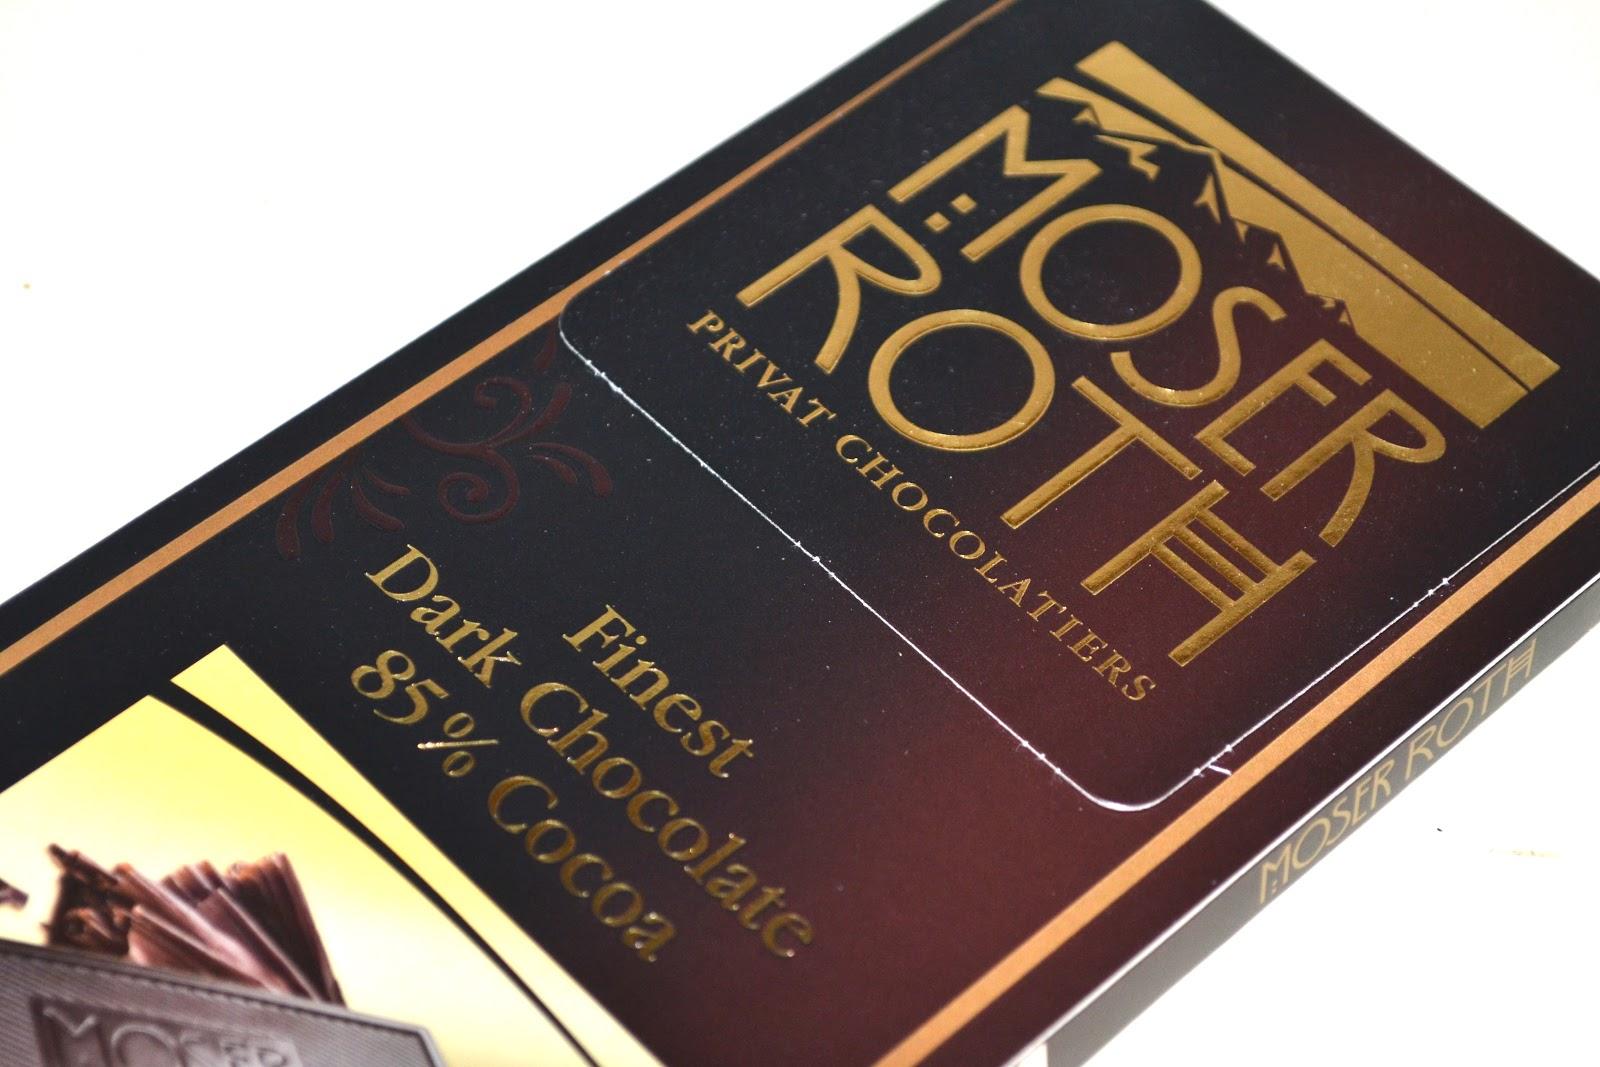 Moser Roth Dark Chocolate  Cocoa